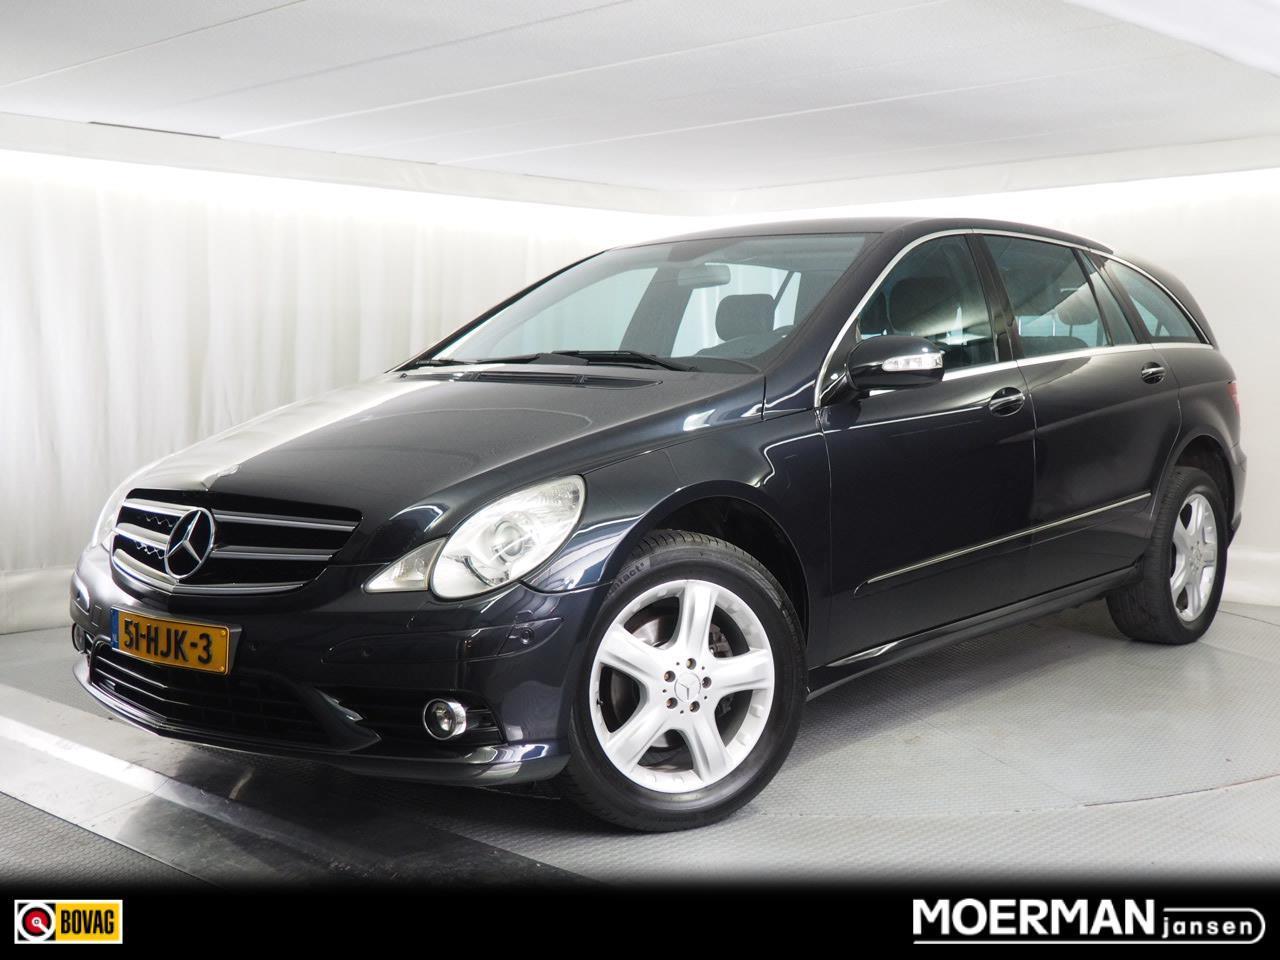 Mercedes-benz R-klasse 350 lang / automaat / leder / 6-persoons / trekhaak / parktronic